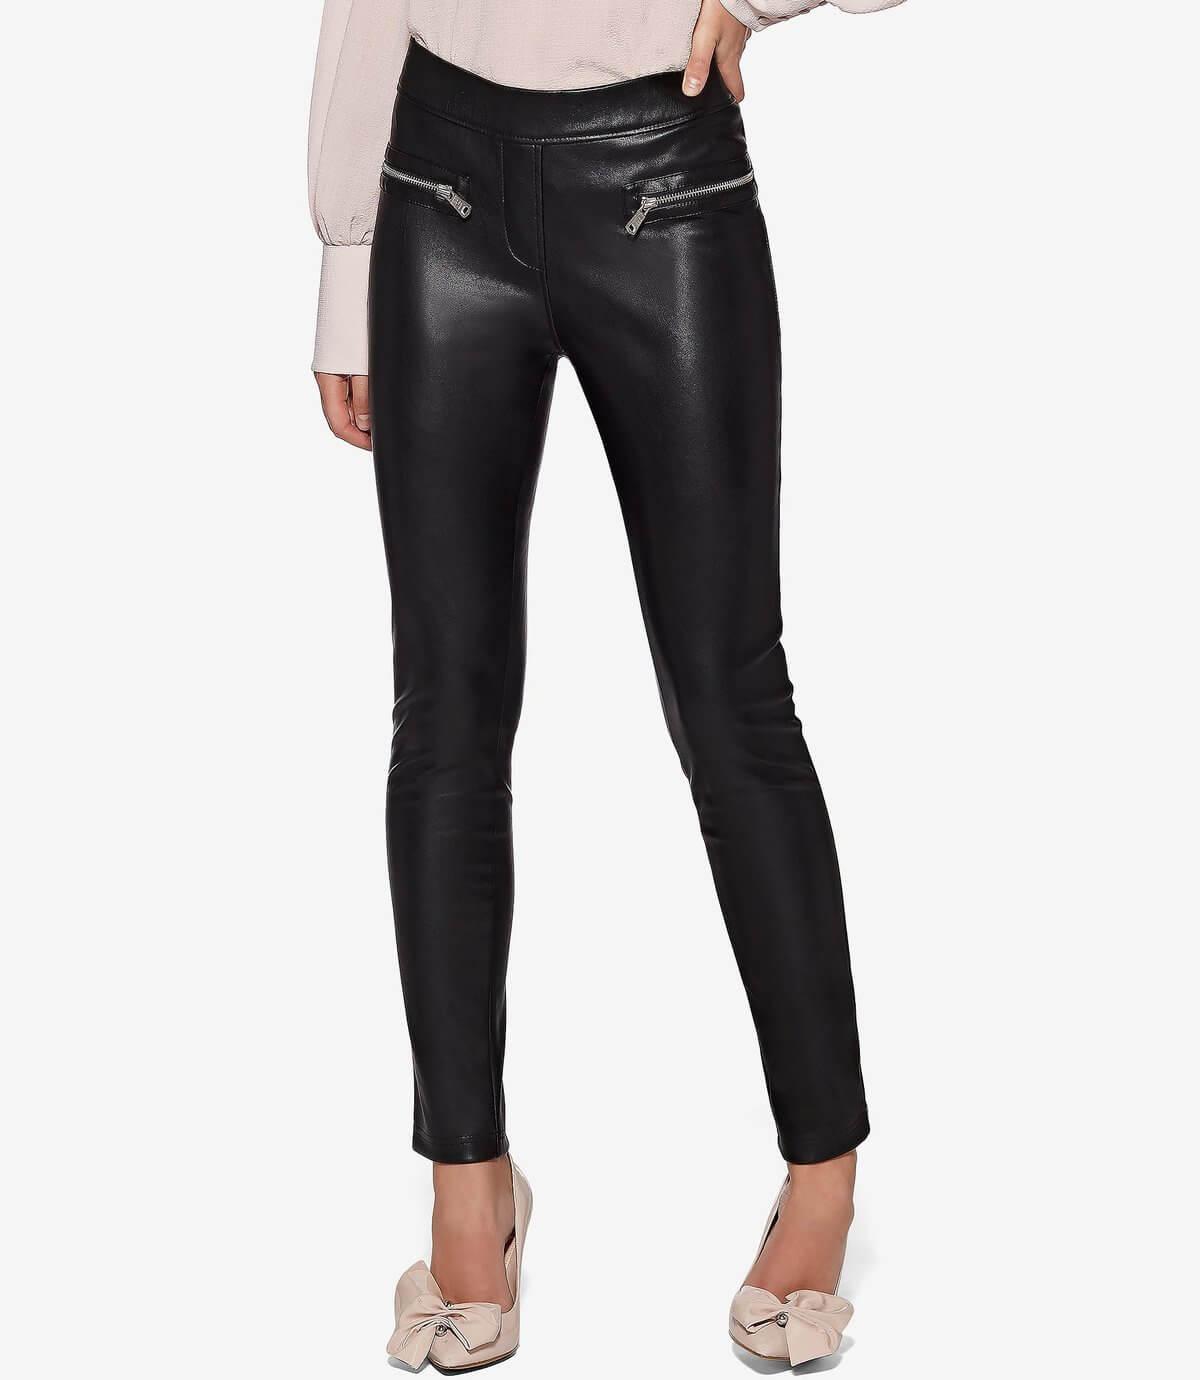 avec-les-filles-famous-vegan-leather-moto-legging.jpg